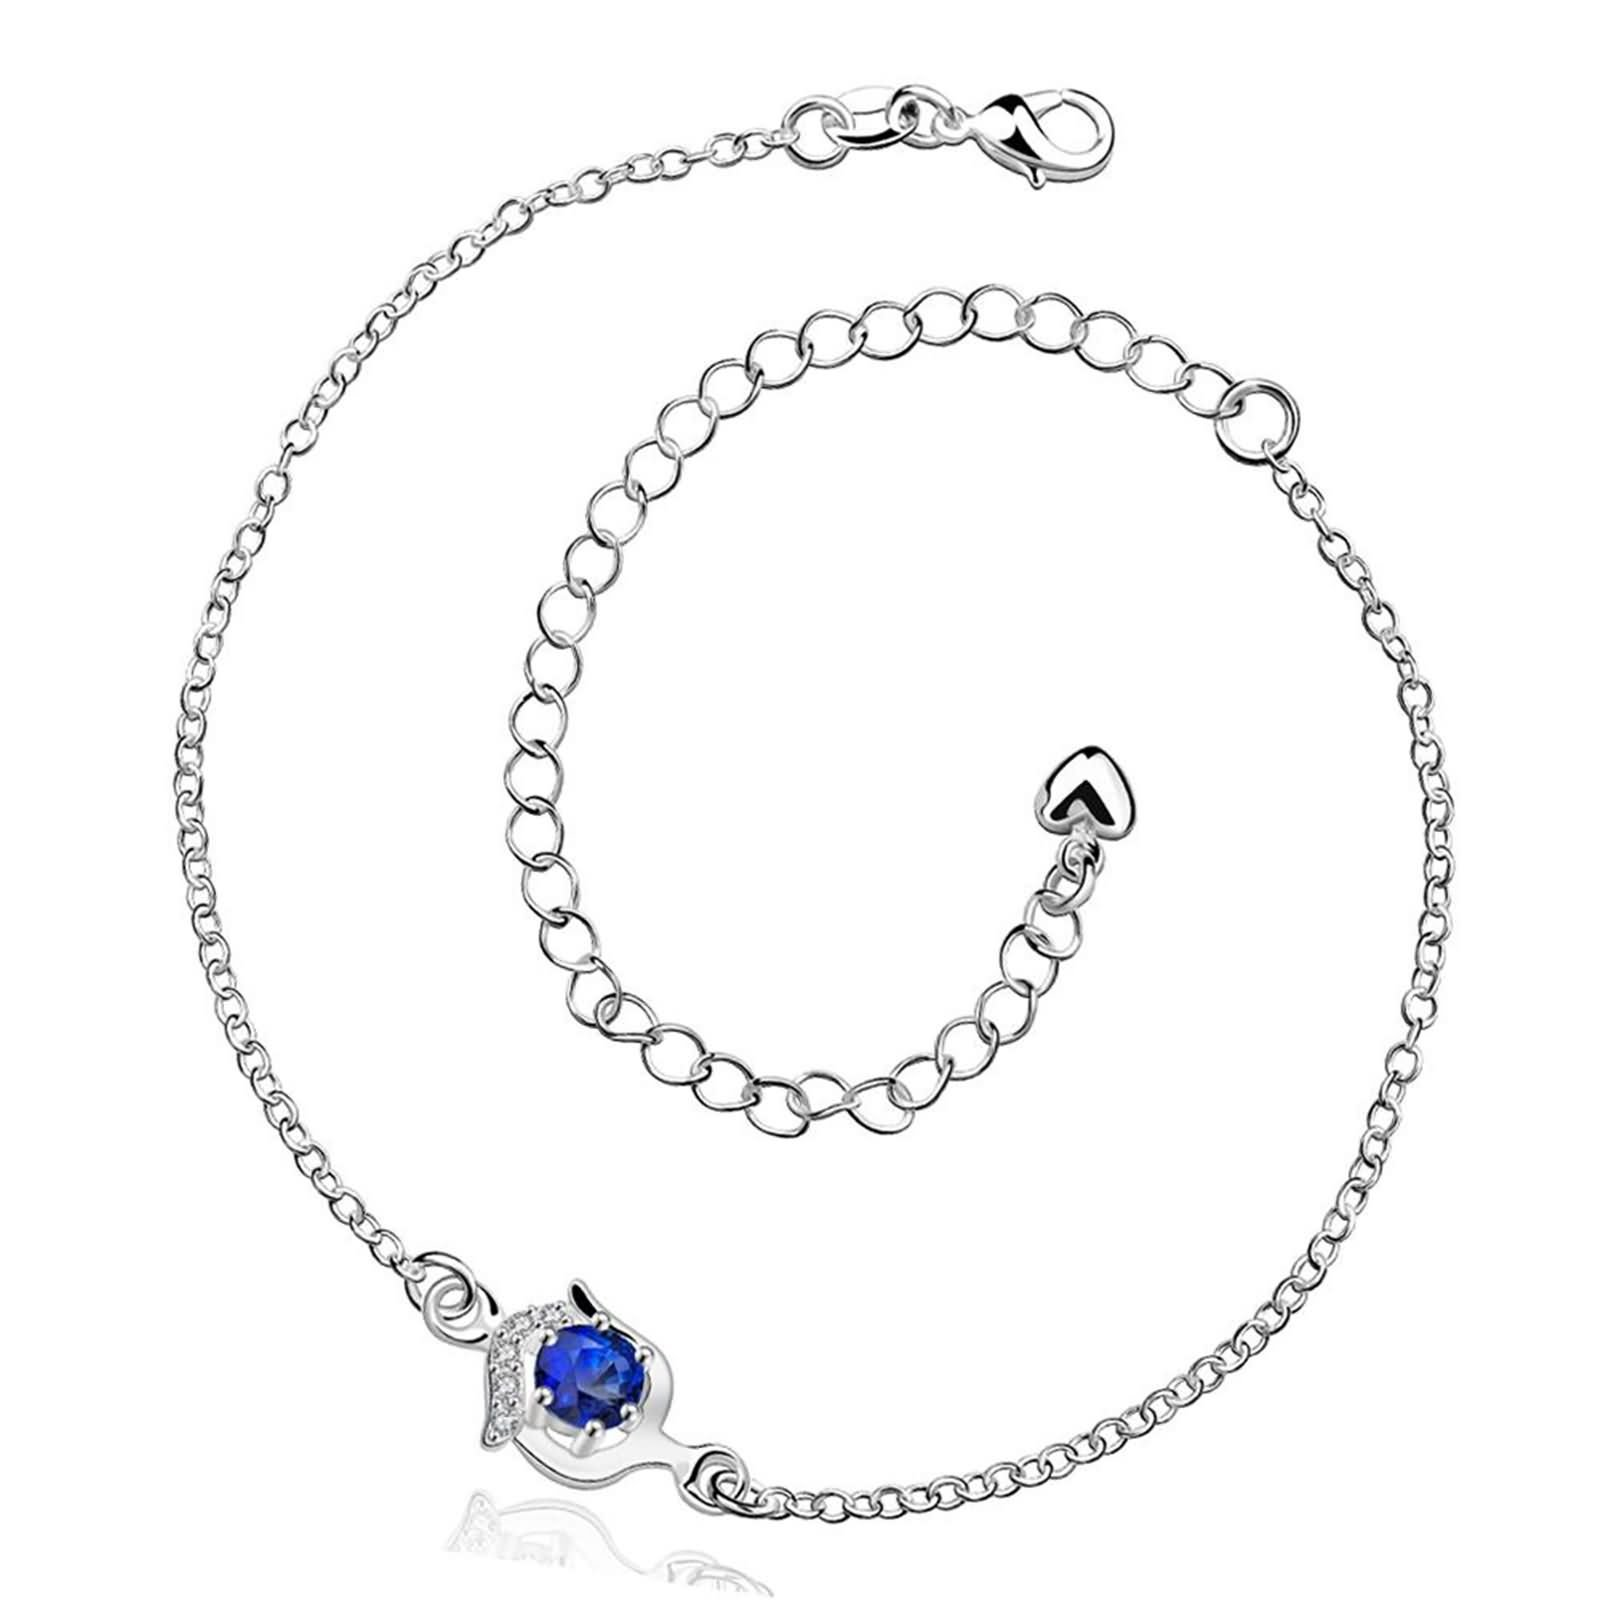 Bishilin Beach Foot Jewelry Wedding Round Cubic Zirconia anklet extender 2 CM